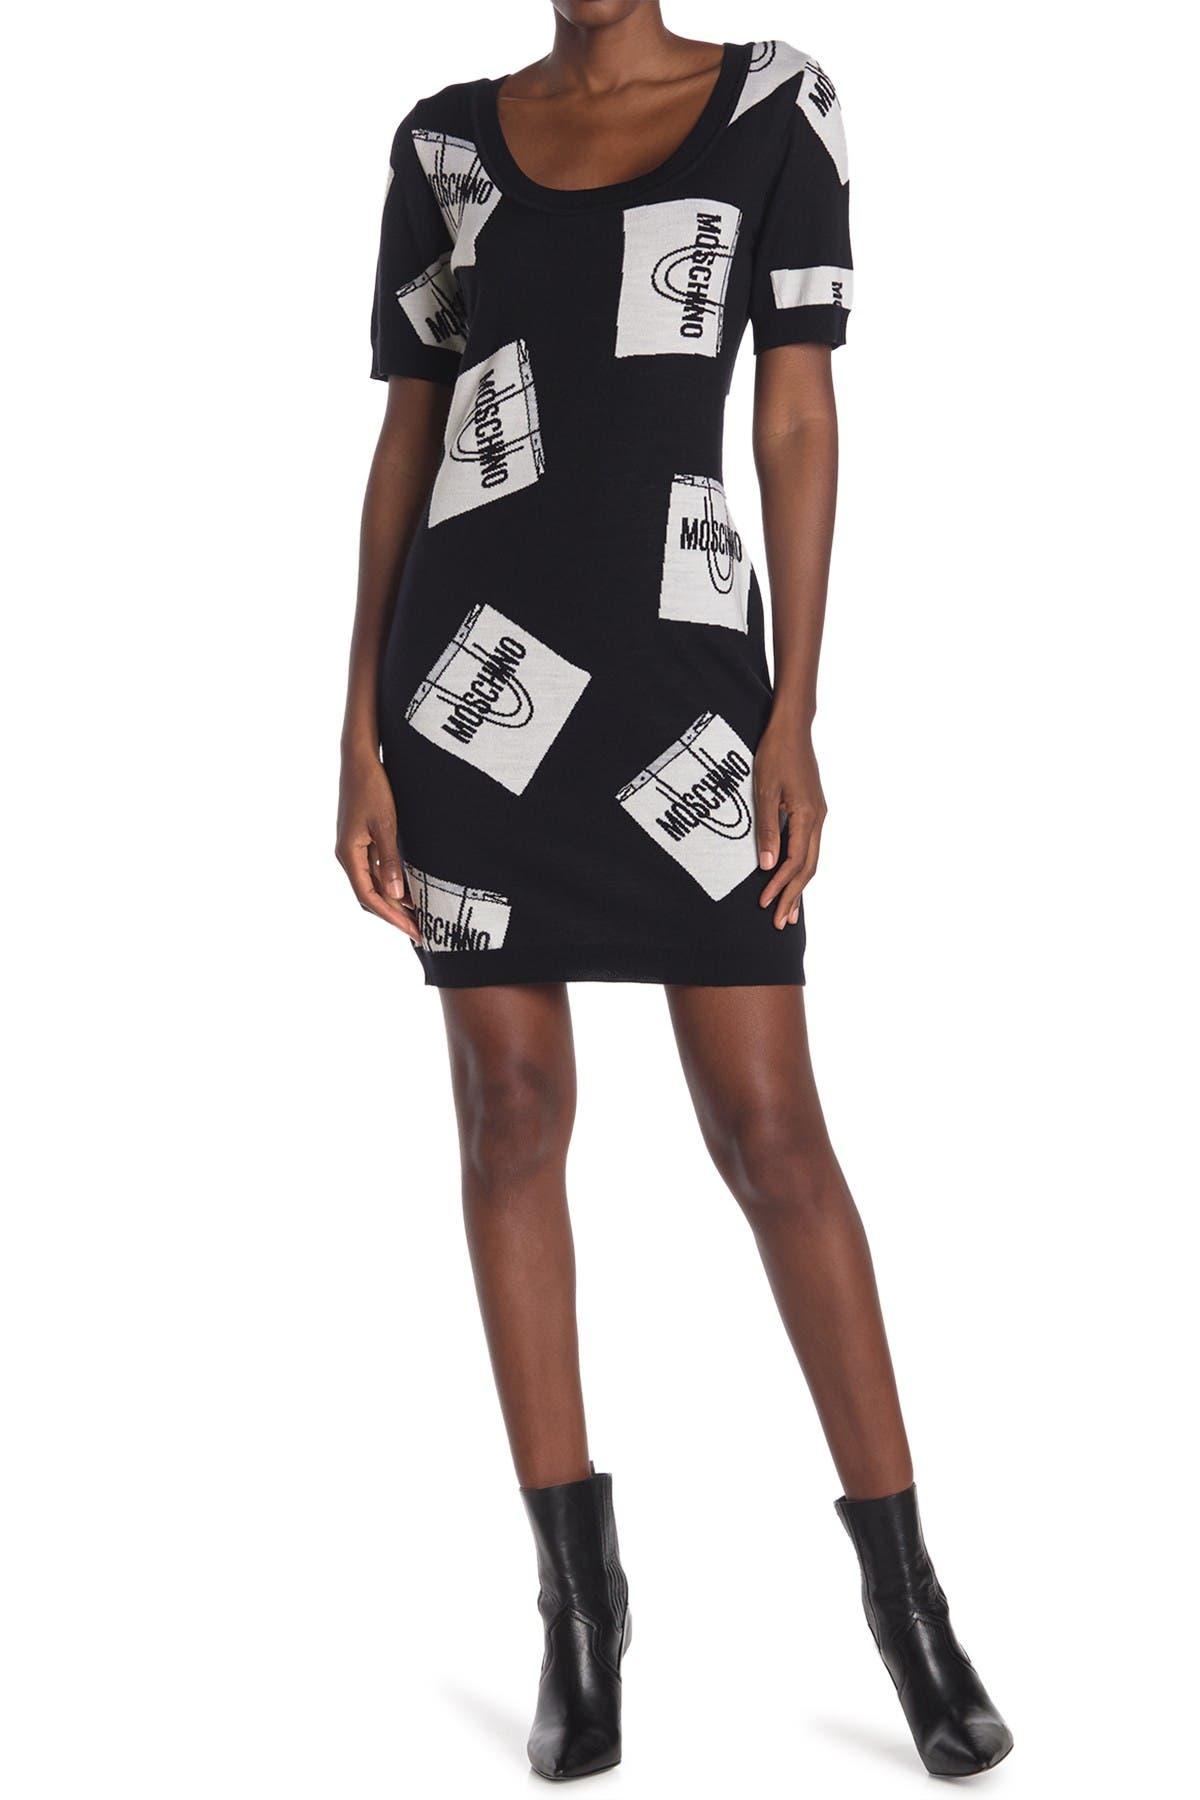 MOSCHINO Printed dress